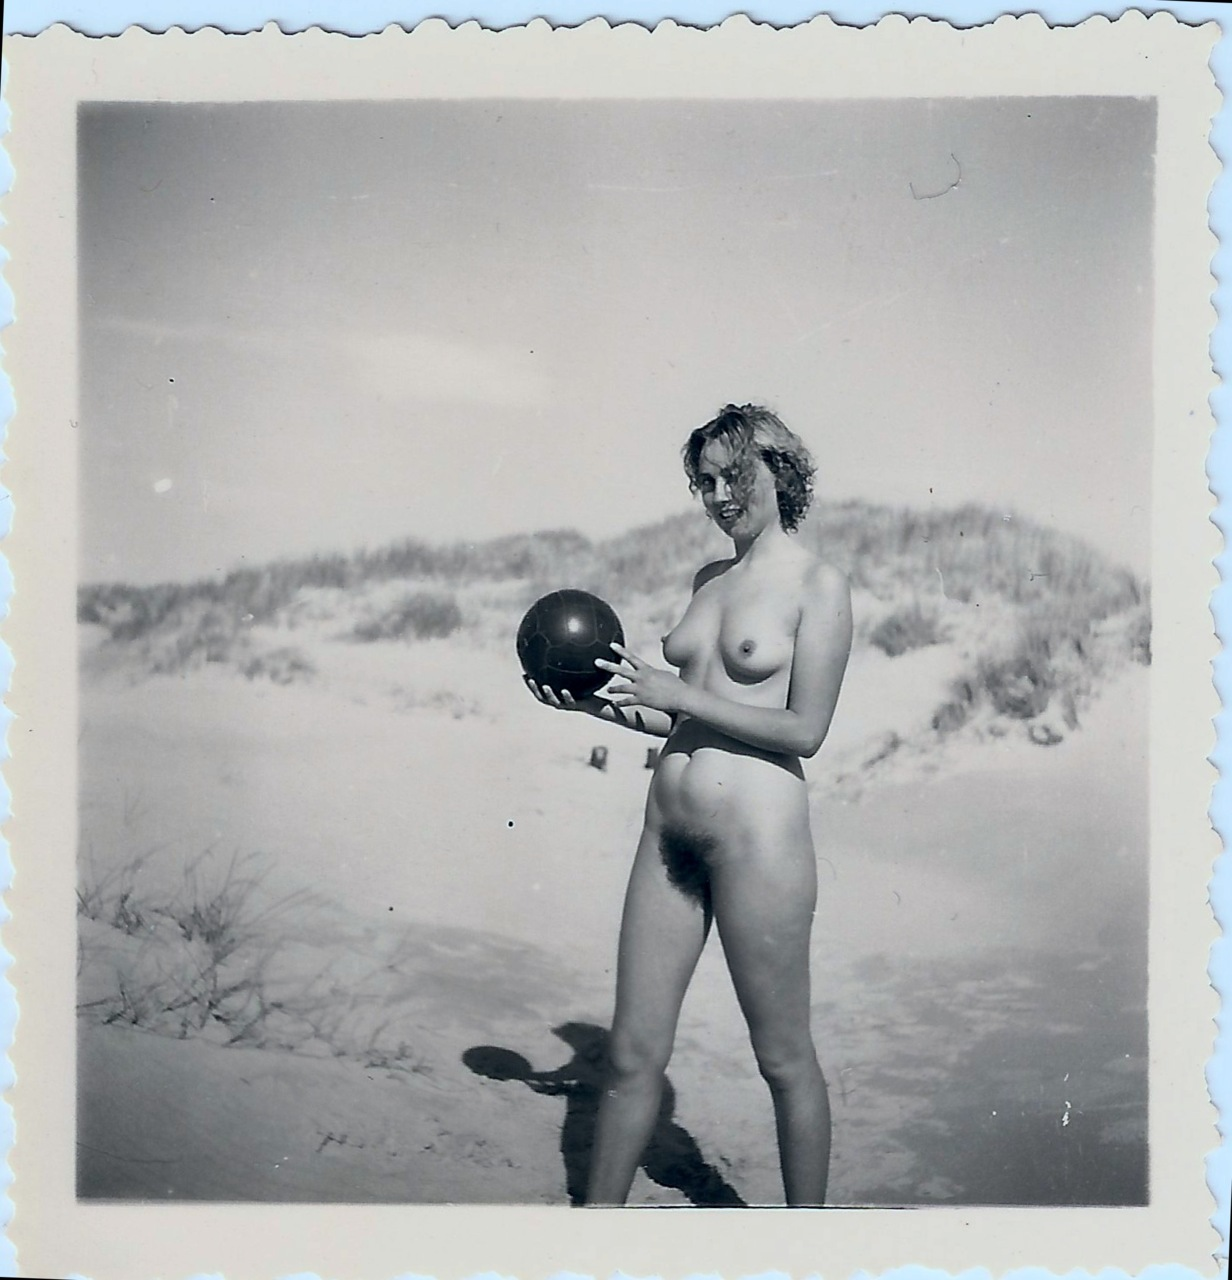 https://www.nudismlife.com/galleries/nudists_and_nude/the_most_natural_nudists/the_most_natural_nudists_0359.jpg